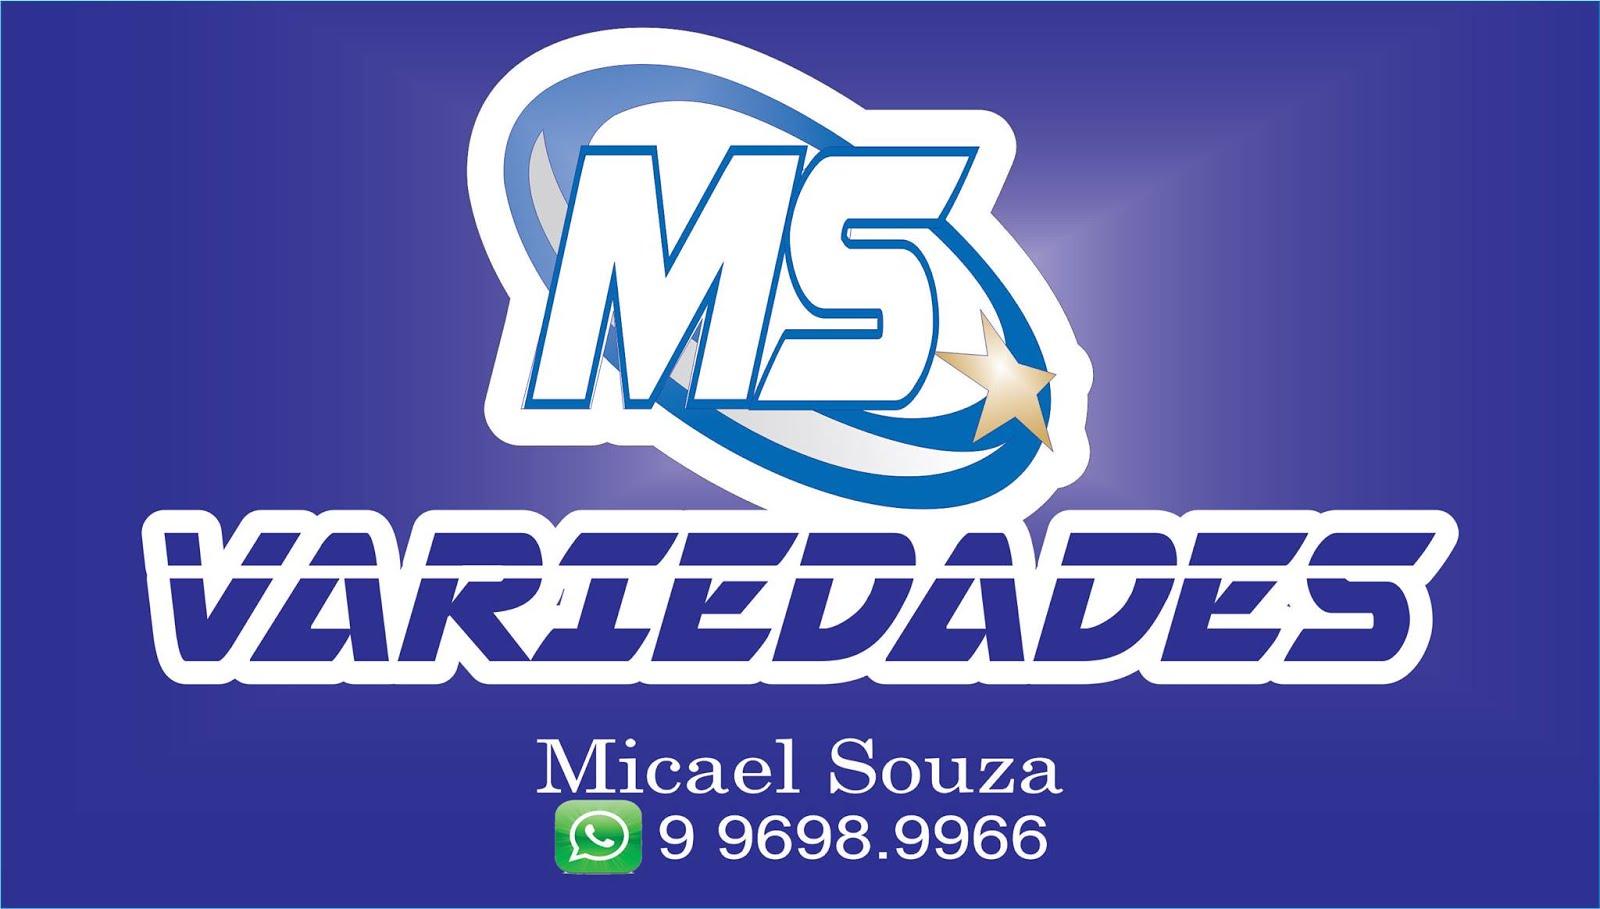 MS Variedades - 99698 9966